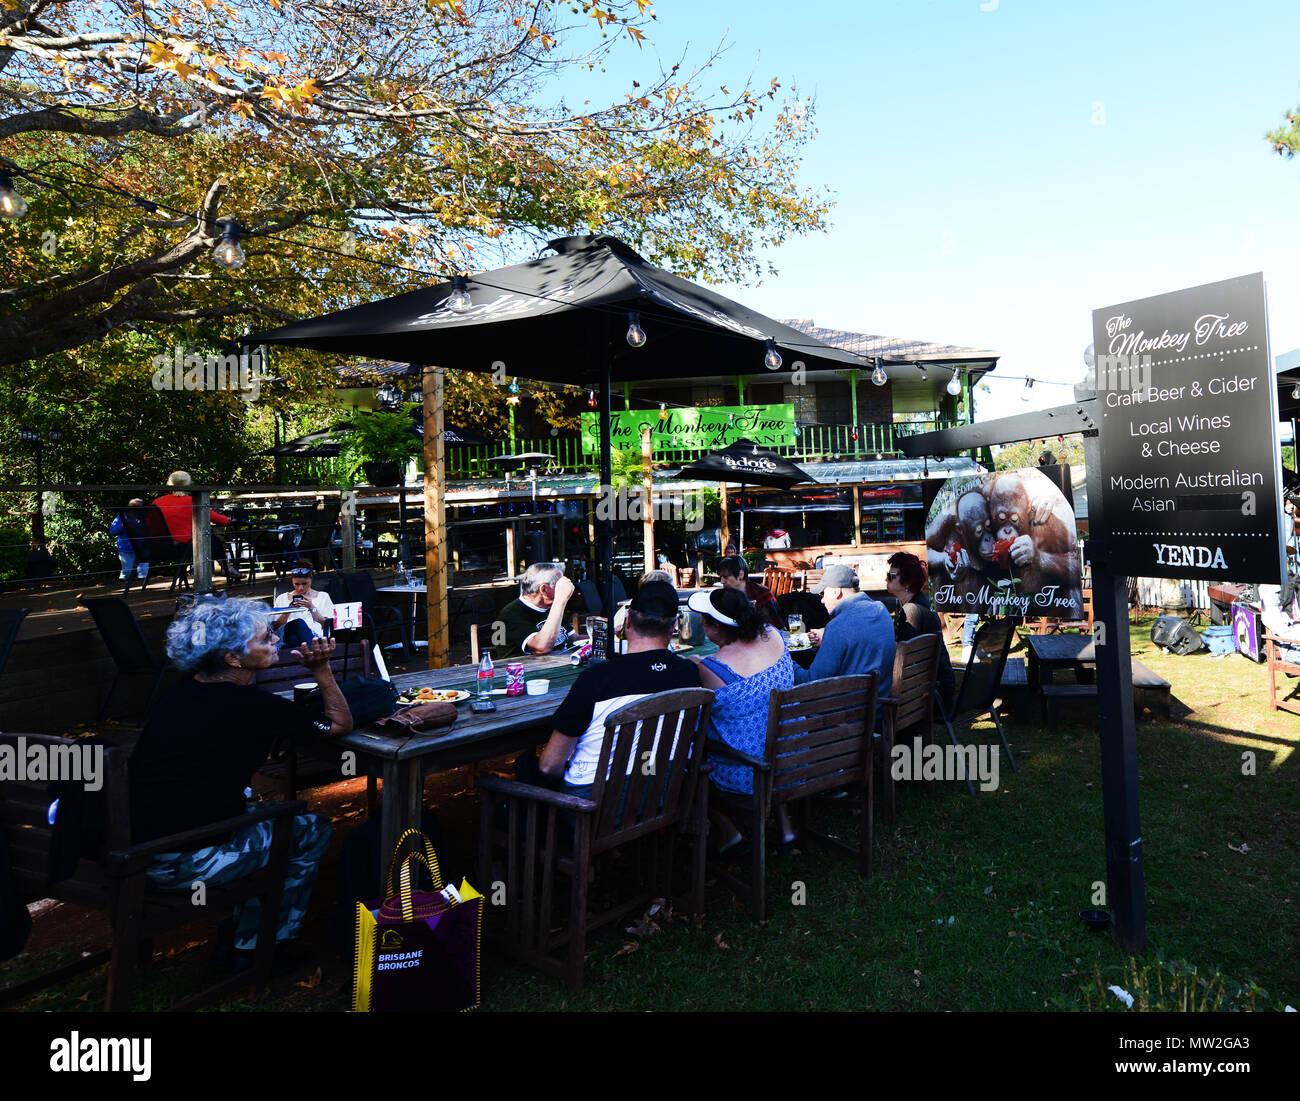 The popular Monkey Tree Bar & Restaurant on Long road in Mt. Tamborine, QLD, Australia. - Stock Image